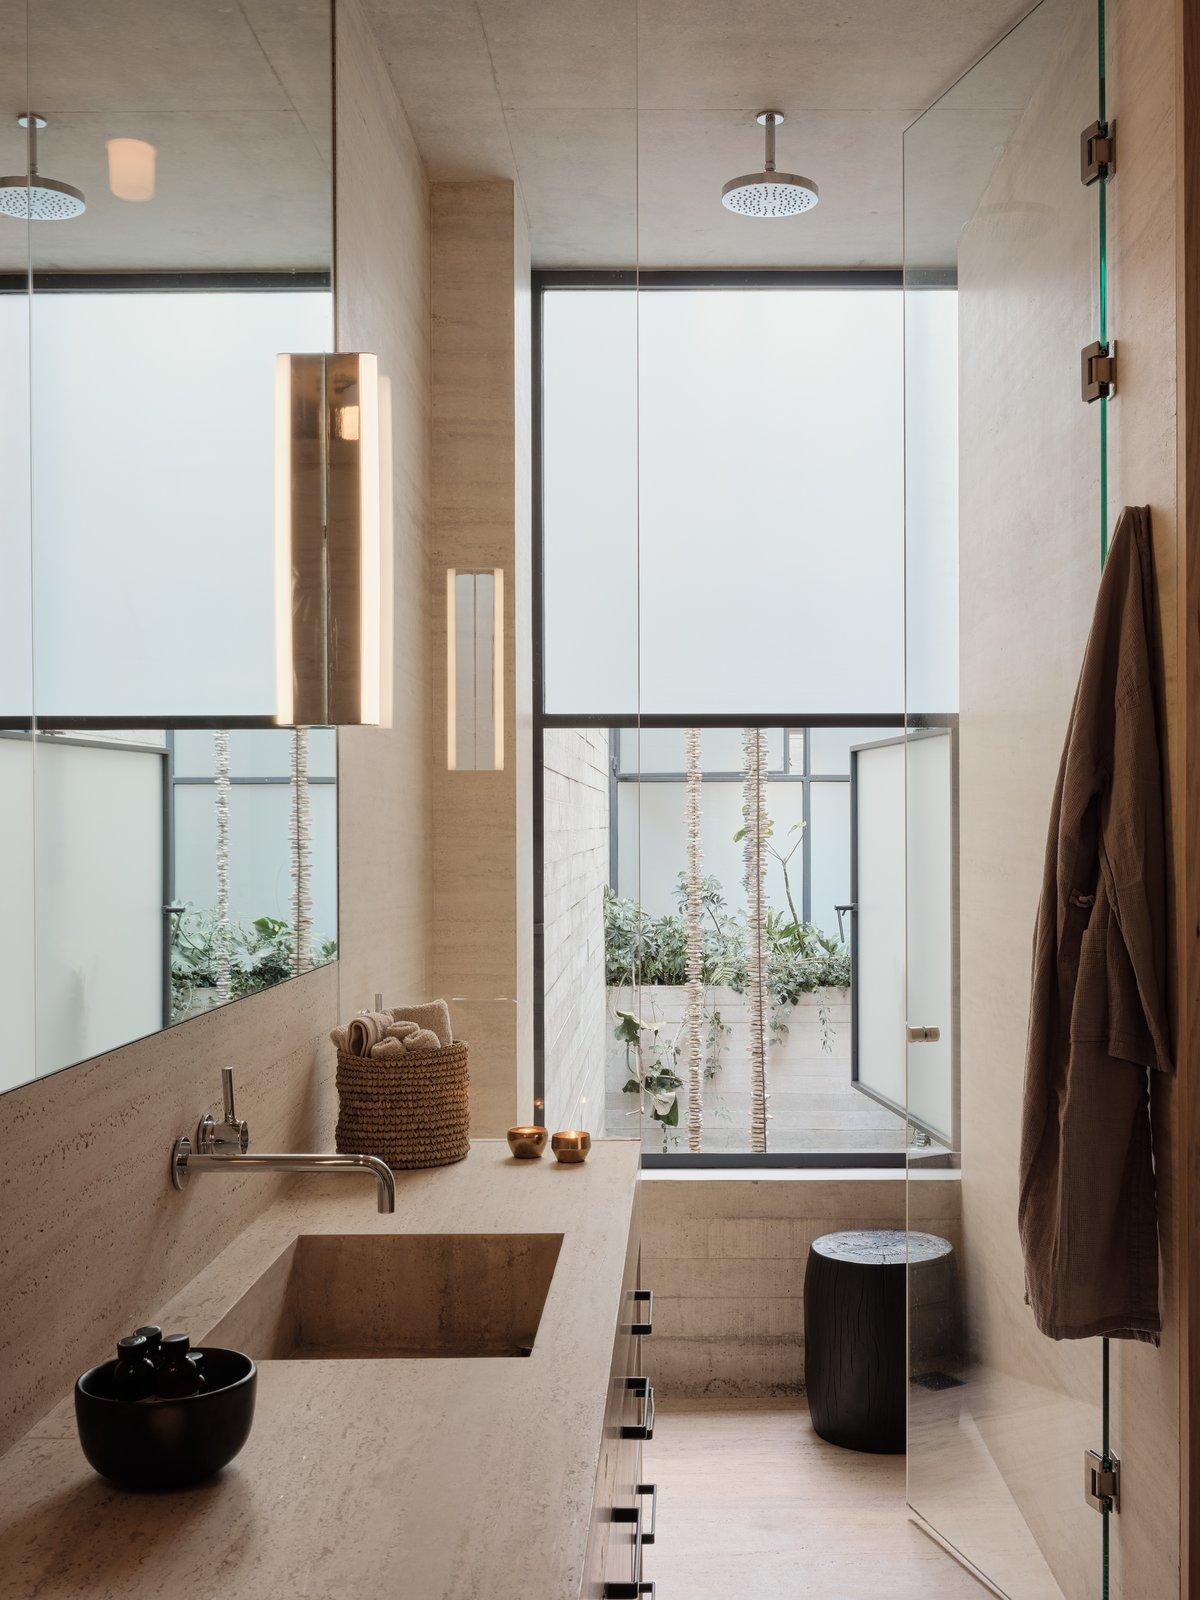 Tennyson 205 Rick Joy Polanco Apartment Bathroom